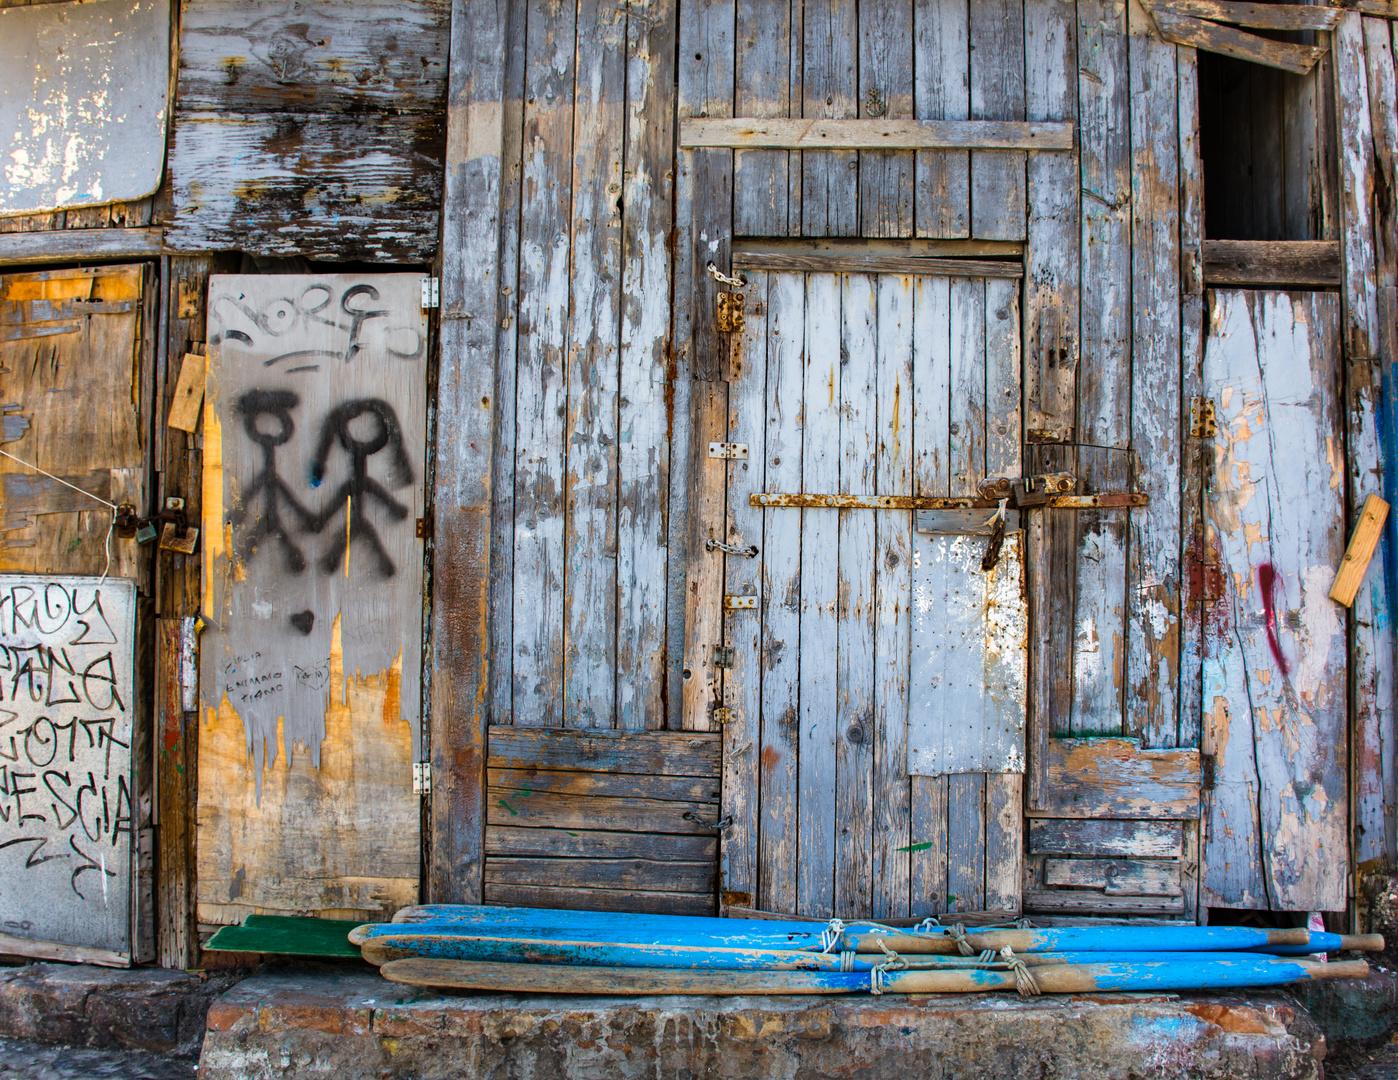 Neapel_Bootshaus-1